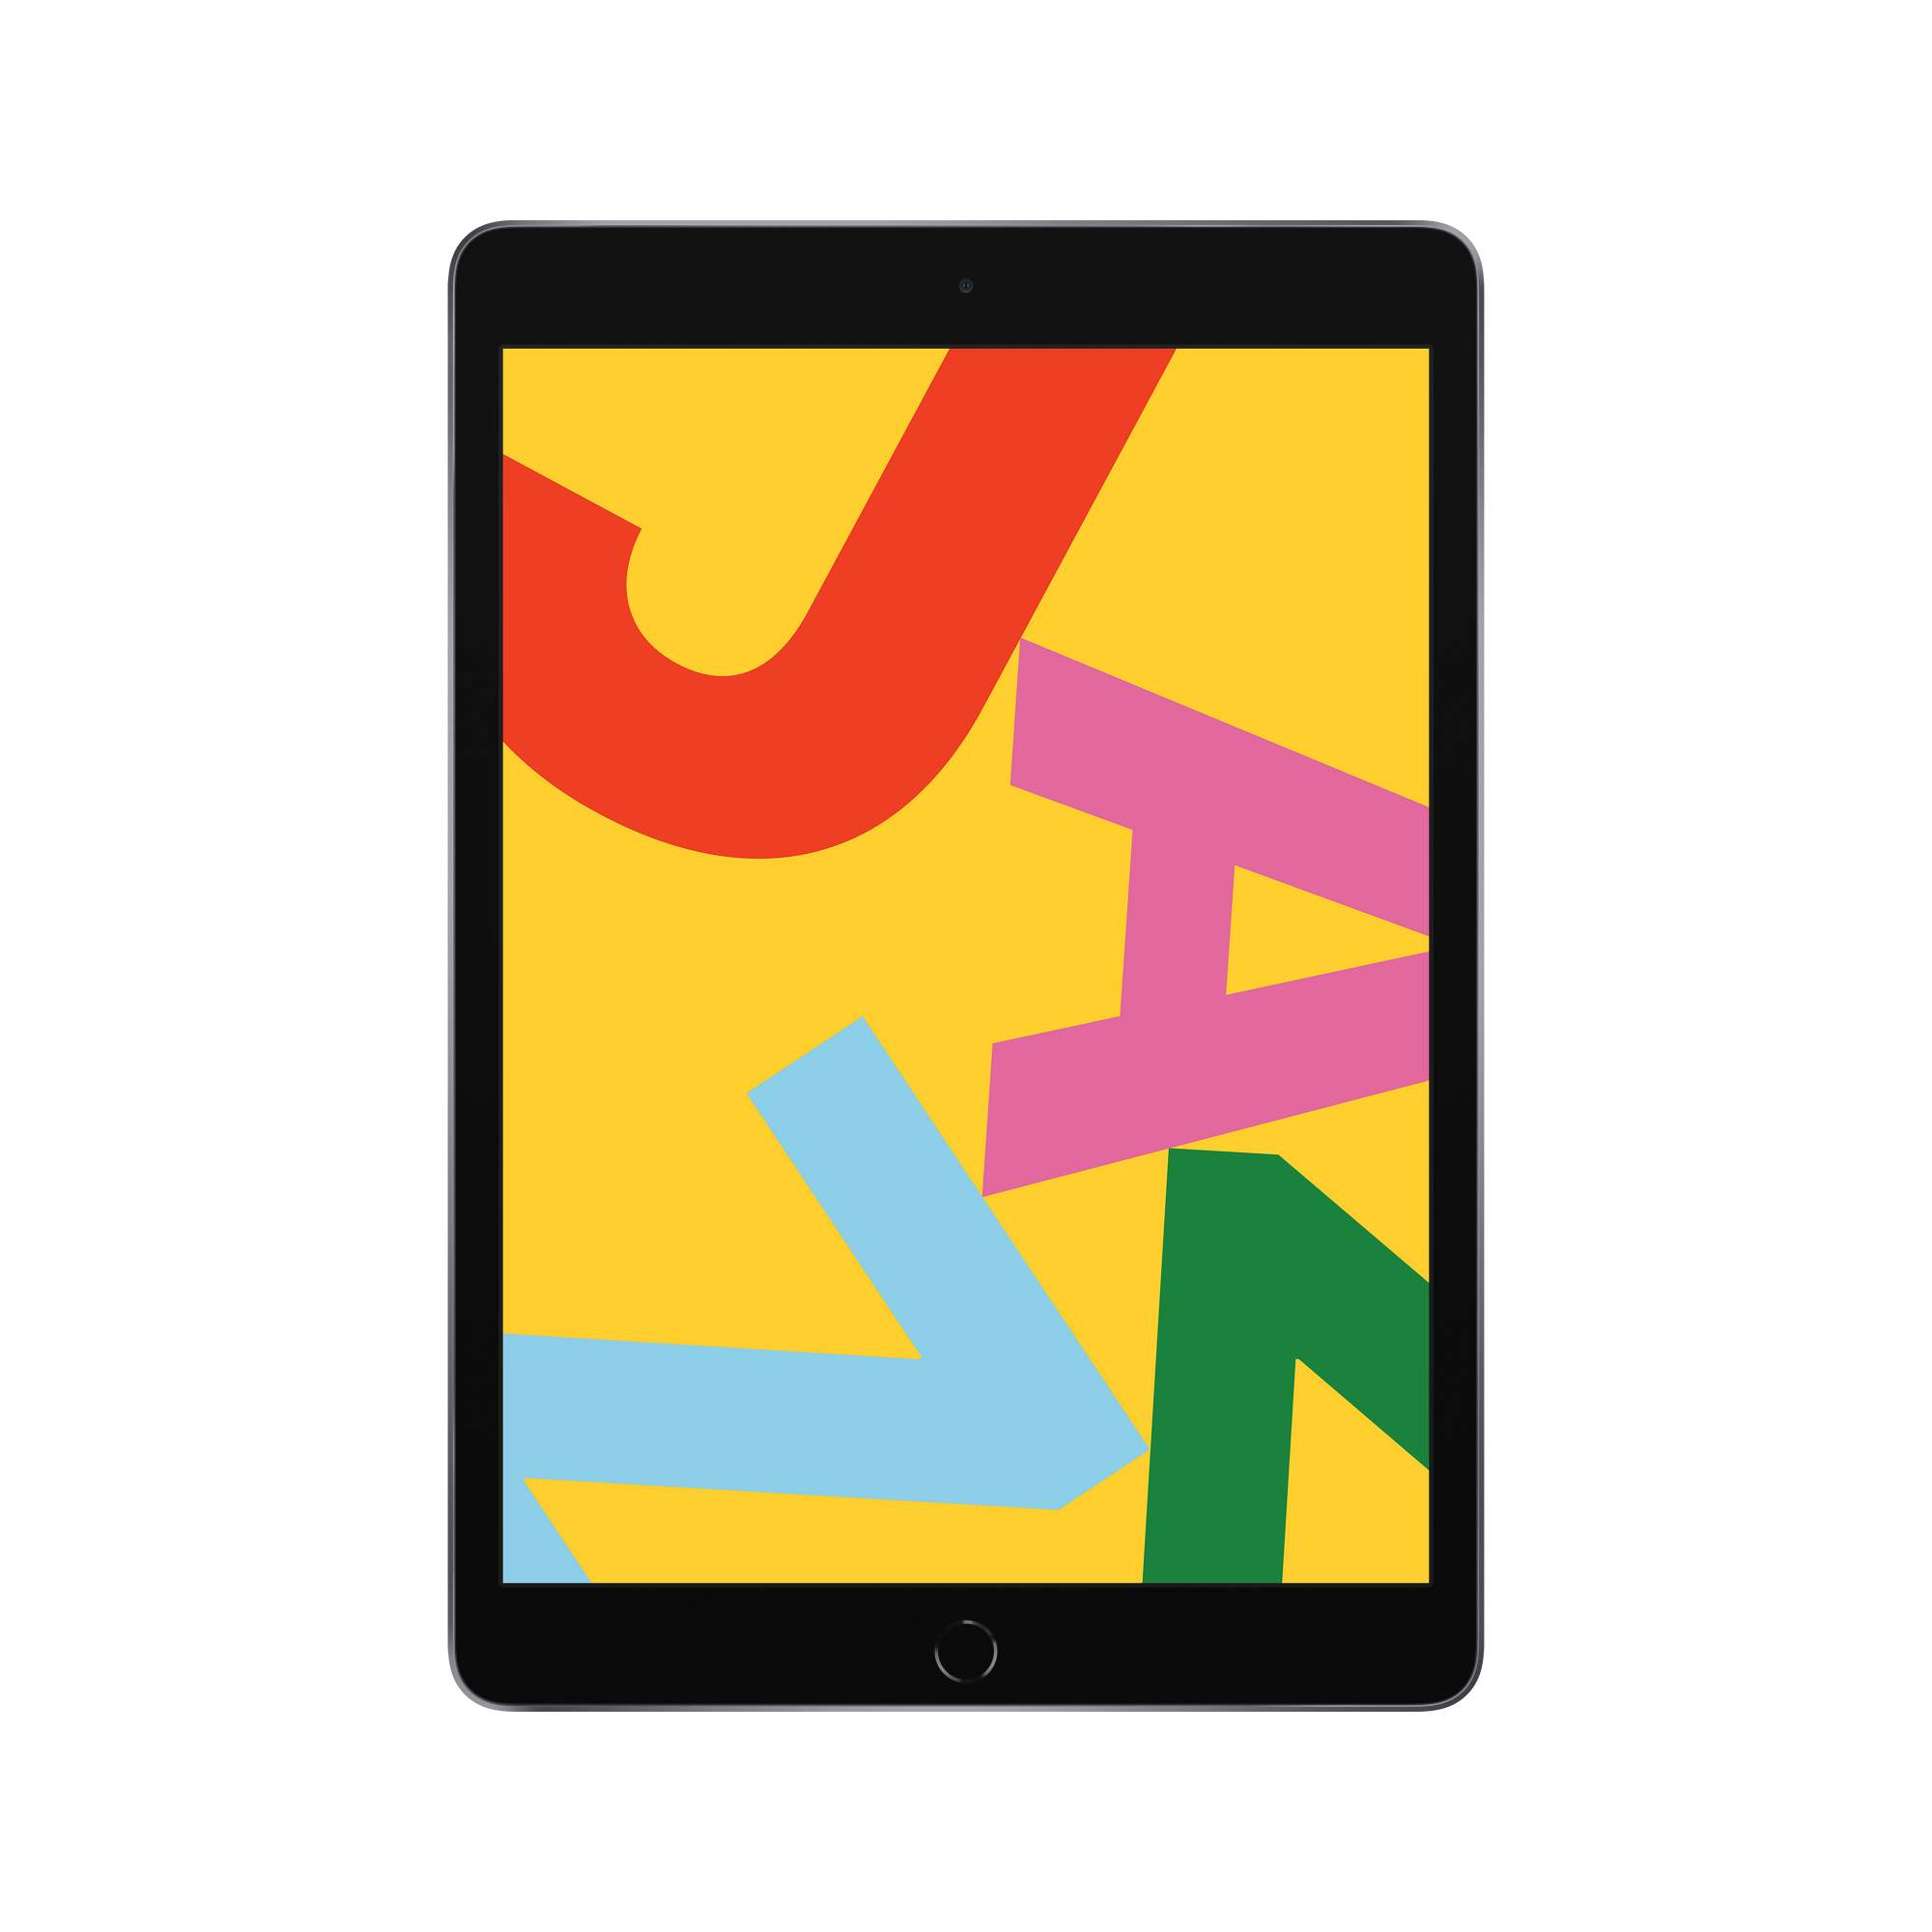 Планшет Apple iPad (2019 New) Wi-Fi 10.2 32GB Space Grey (MW742RU/A)